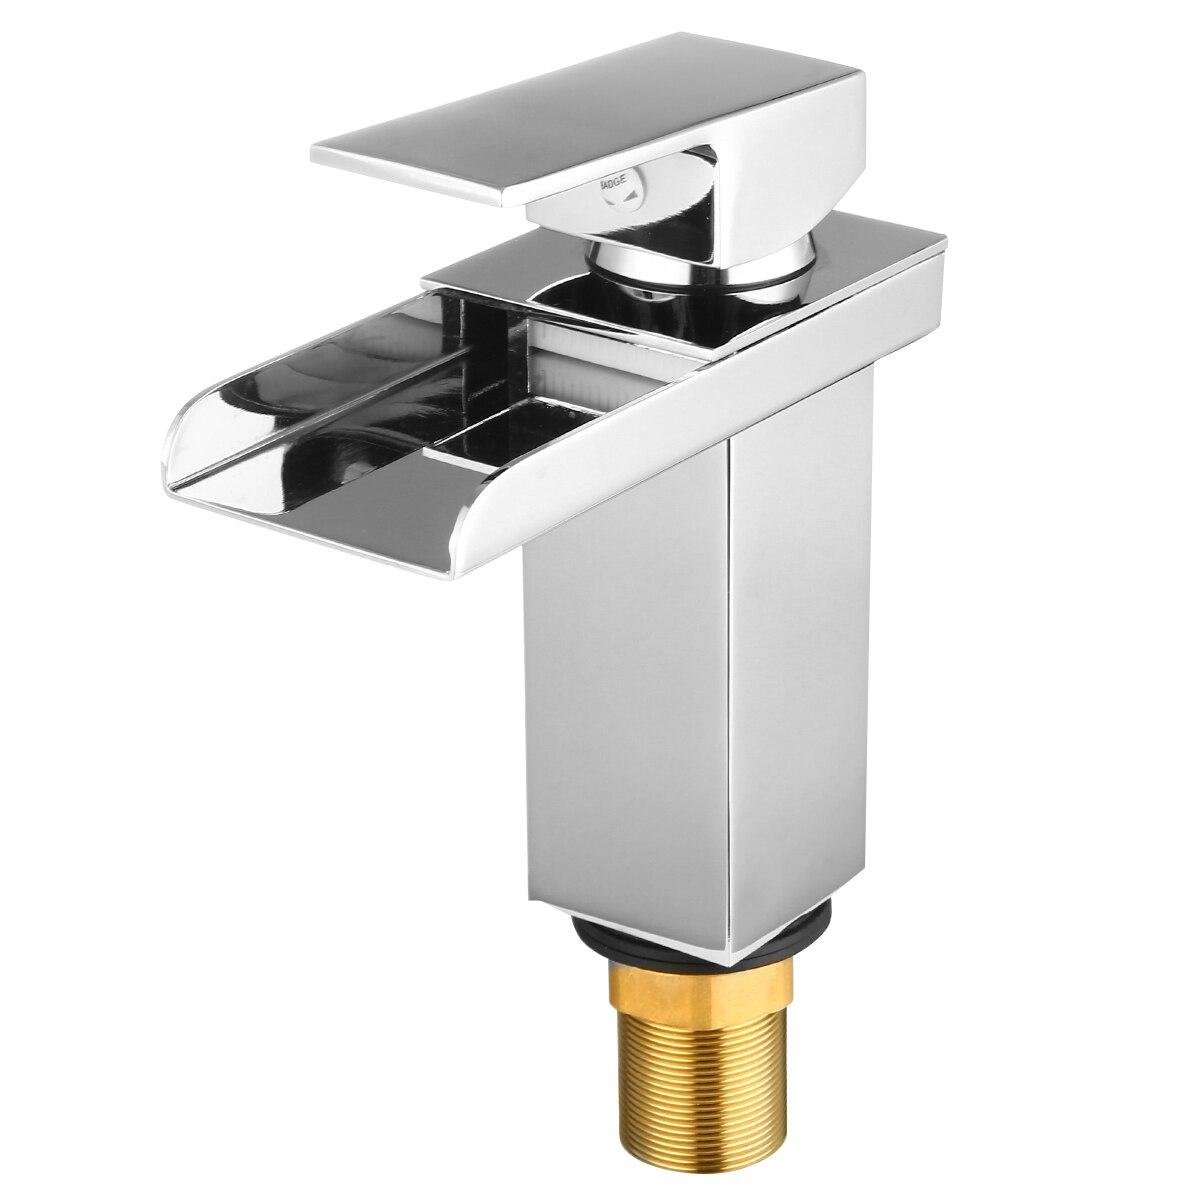 Mayitr Brass Chrome Waterfall Mixer Tap Kitchen Bathroom Single Handle Single Hole Sink Bathroom Fixtures FaucetsMayitr Brass Chrome Waterfall Mixer Tap Kitchen Bathroom Single Handle Single Hole Sink Bathroom Fixtures Faucets